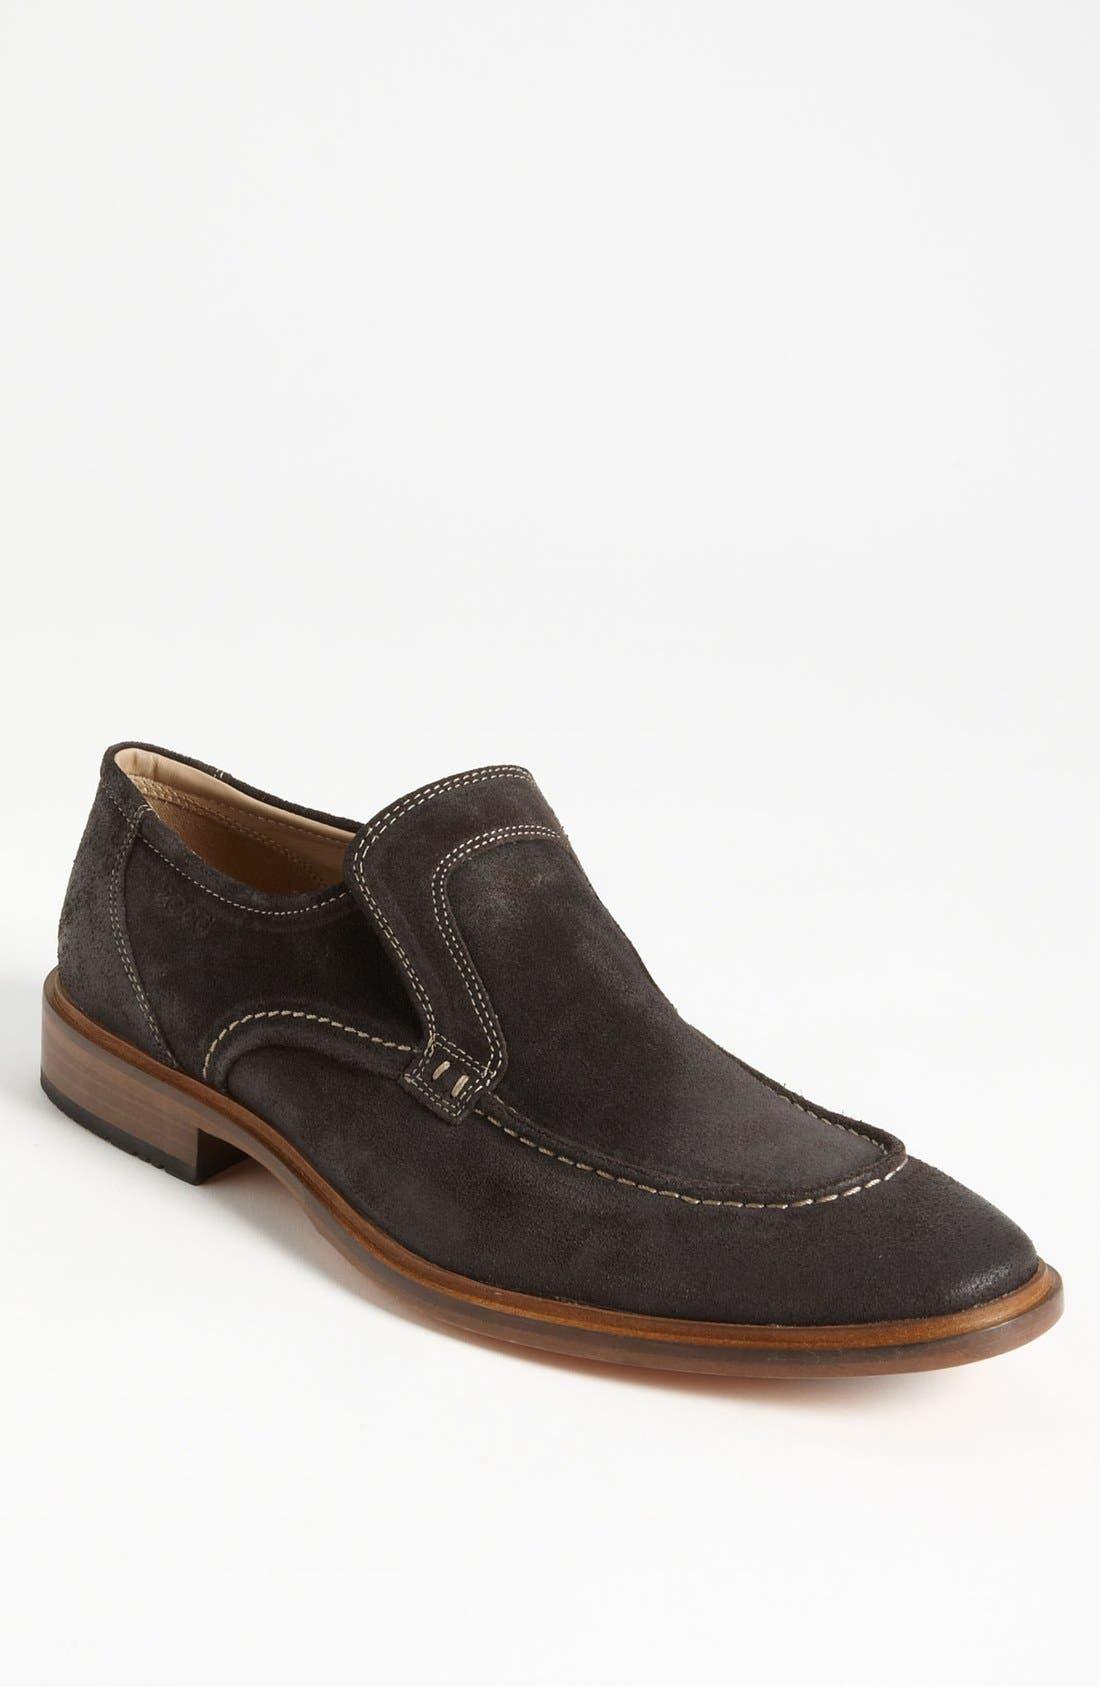 Alternate Image 1 Selected - ECCO 'Pedoso' Venetian Loafer (Men)